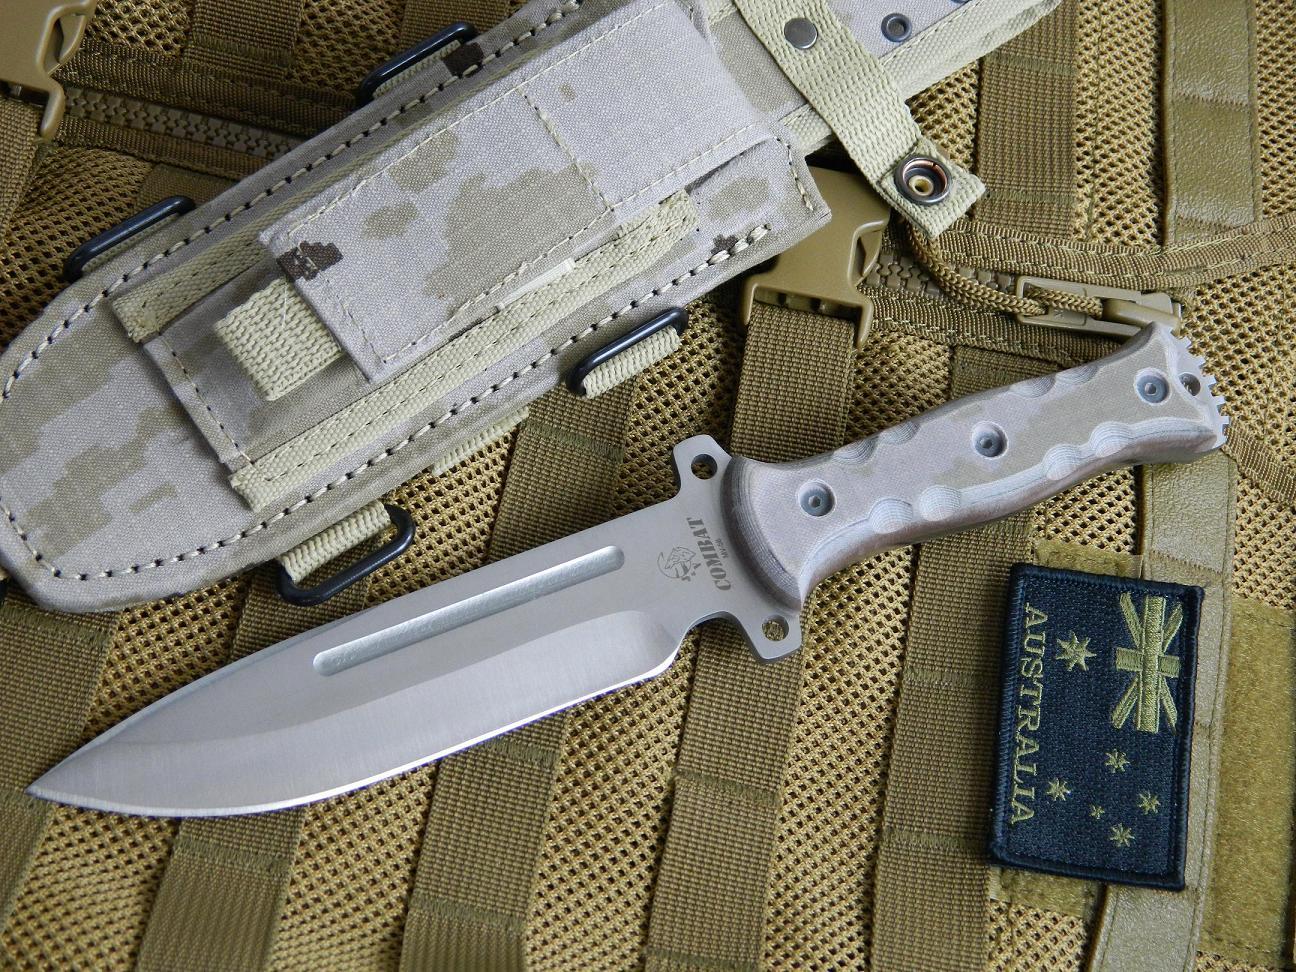 J Amp V Adventure Knives Kizlyar Knives Australia Knives